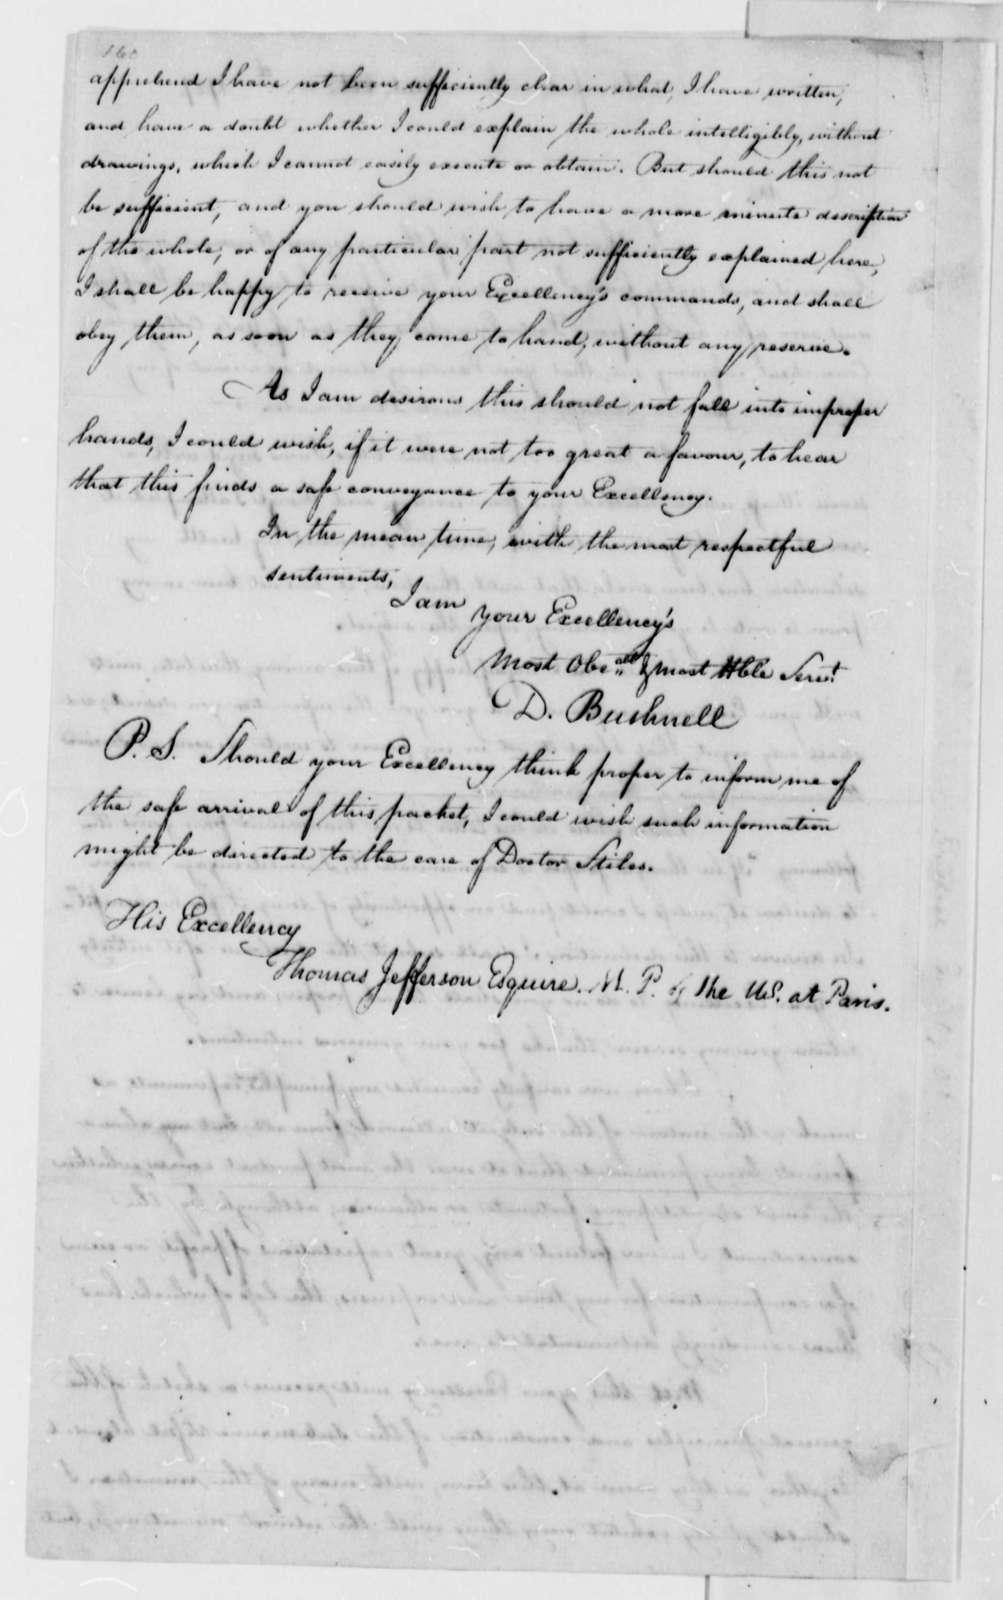 David Bushnell to Thomas Jefferson, October 1787